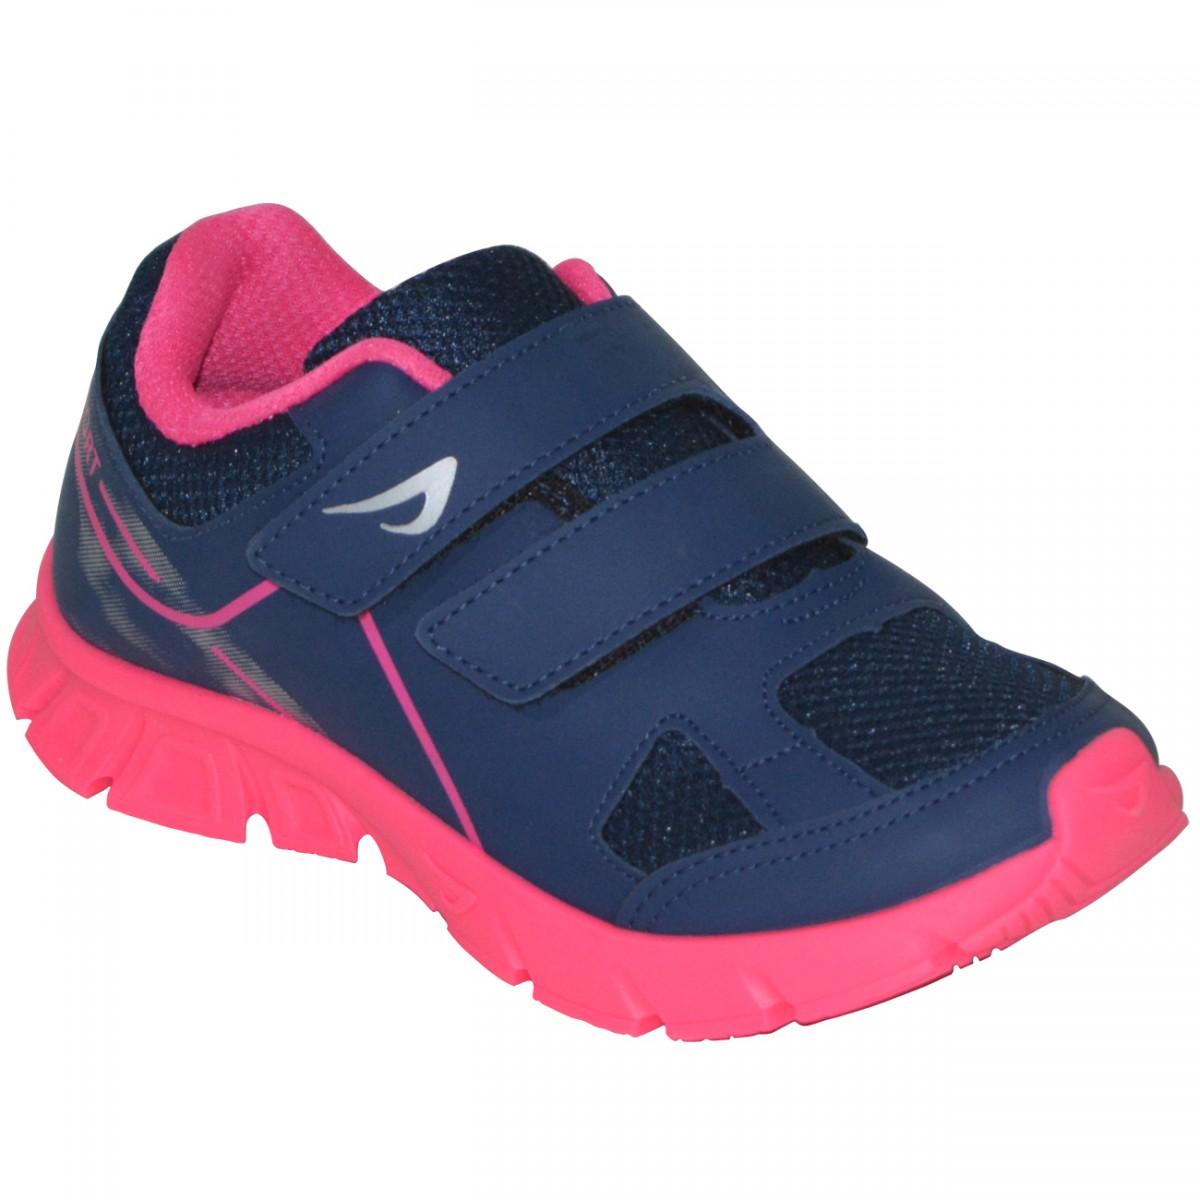 4f8457072 Tenis Ortopé New Jogging 2137017 Juvenil 2137017 - Marinho/Pink - Chuteira  Nike, Adidas. Sandalias Femininas. Sandy Calçados